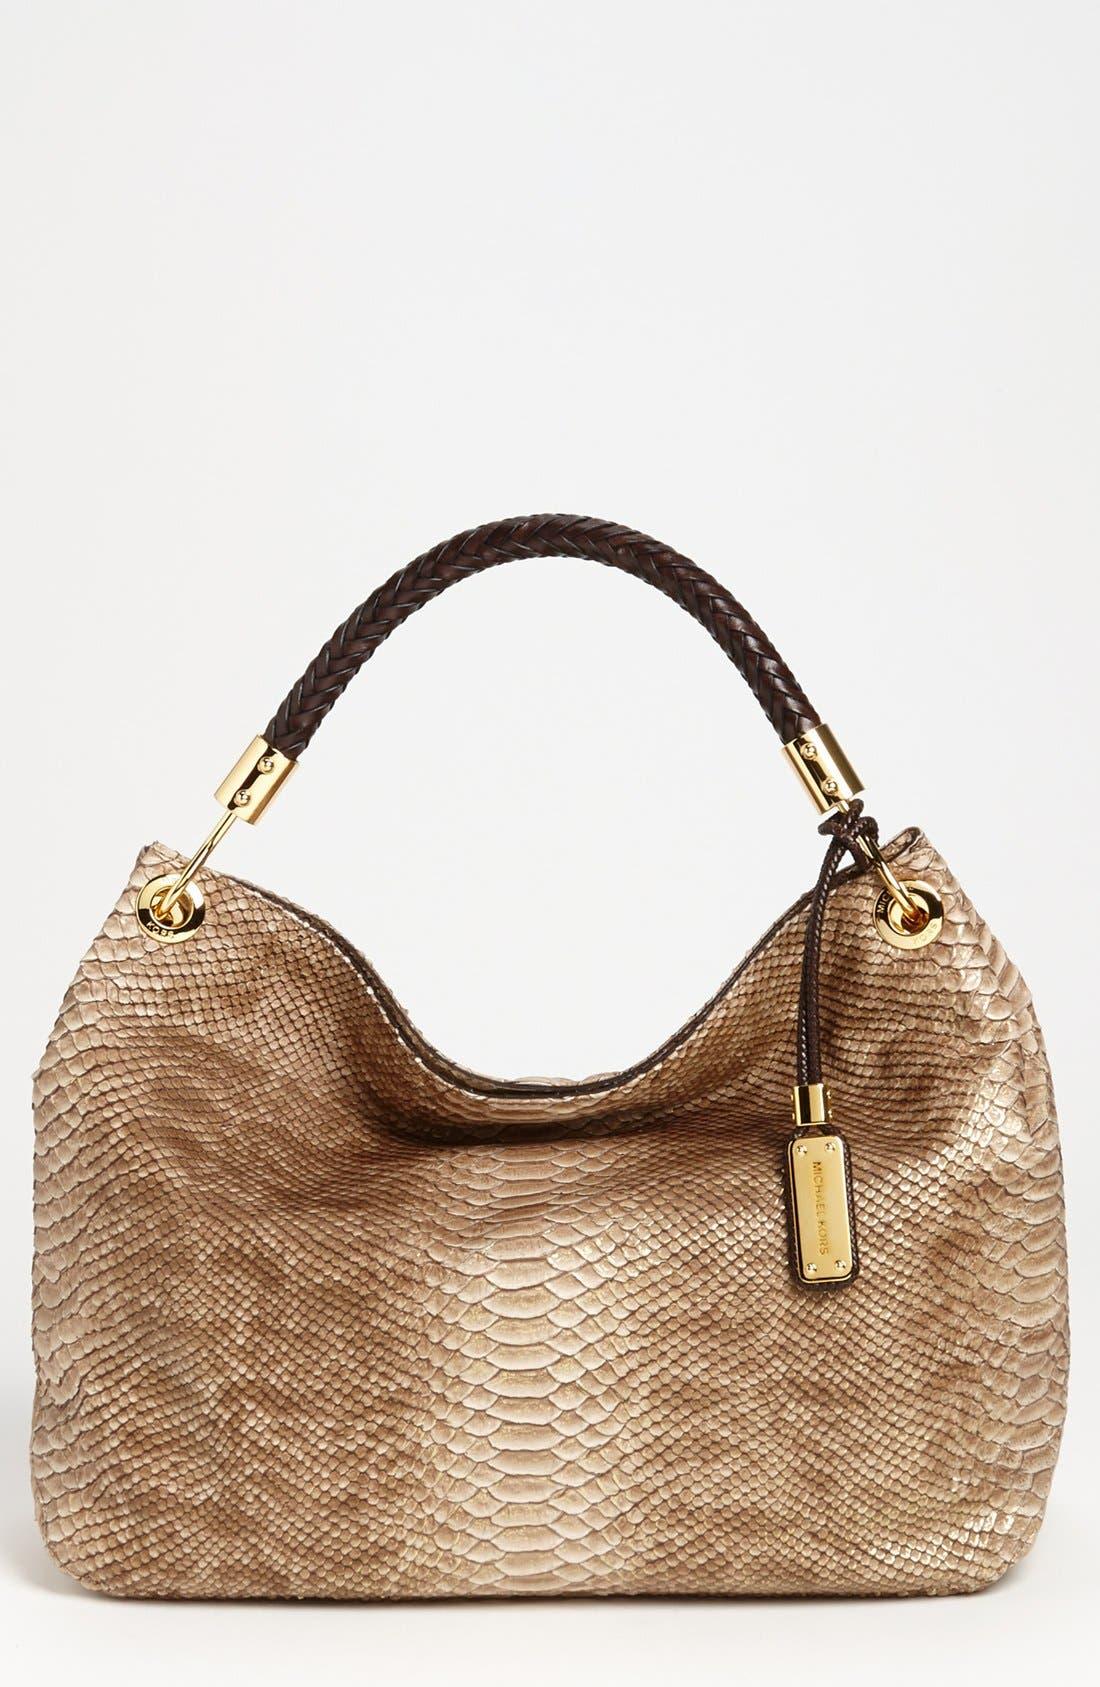 Main Image - Michael Kors 'Skorpios' Python Print Shoulder Bag